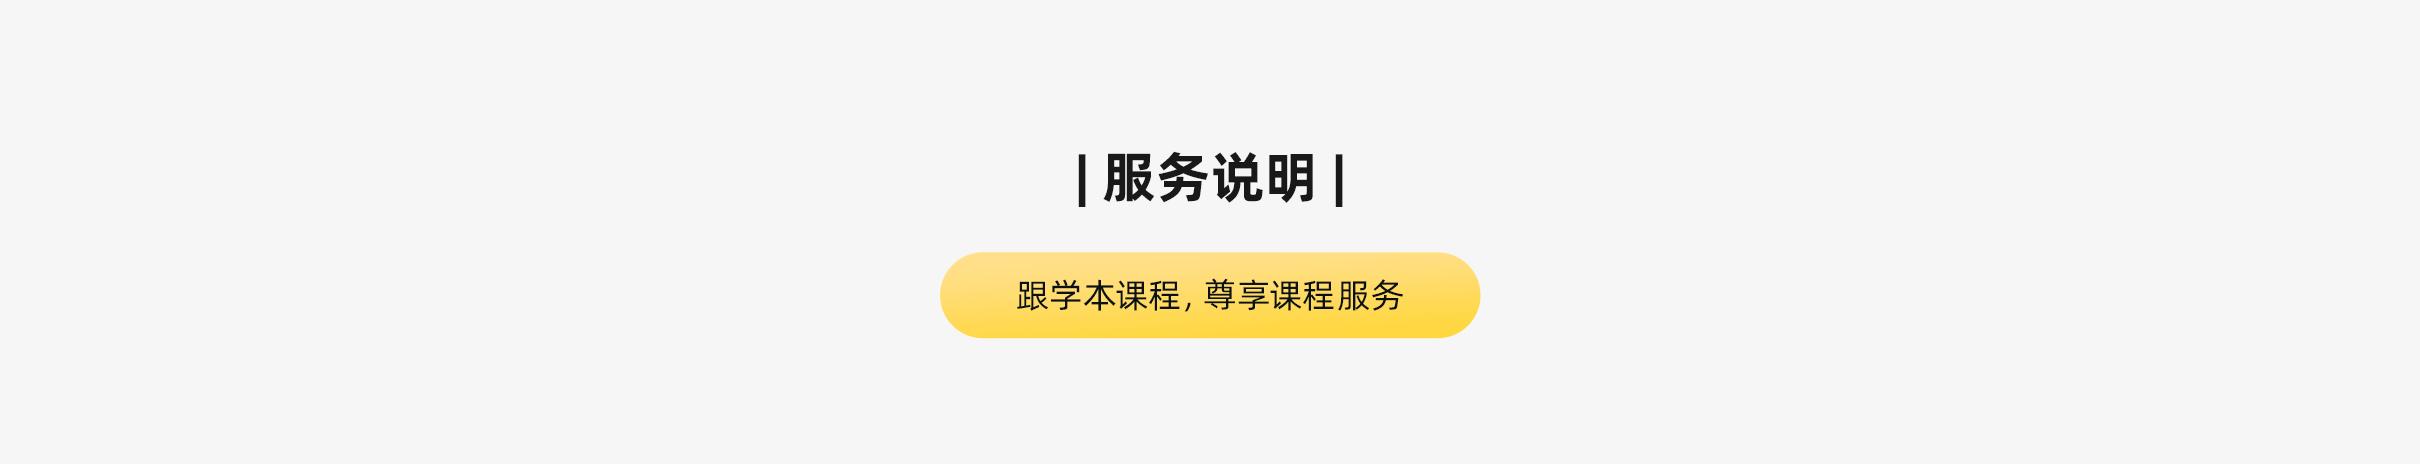 (yellow)服务模块_05.jpg